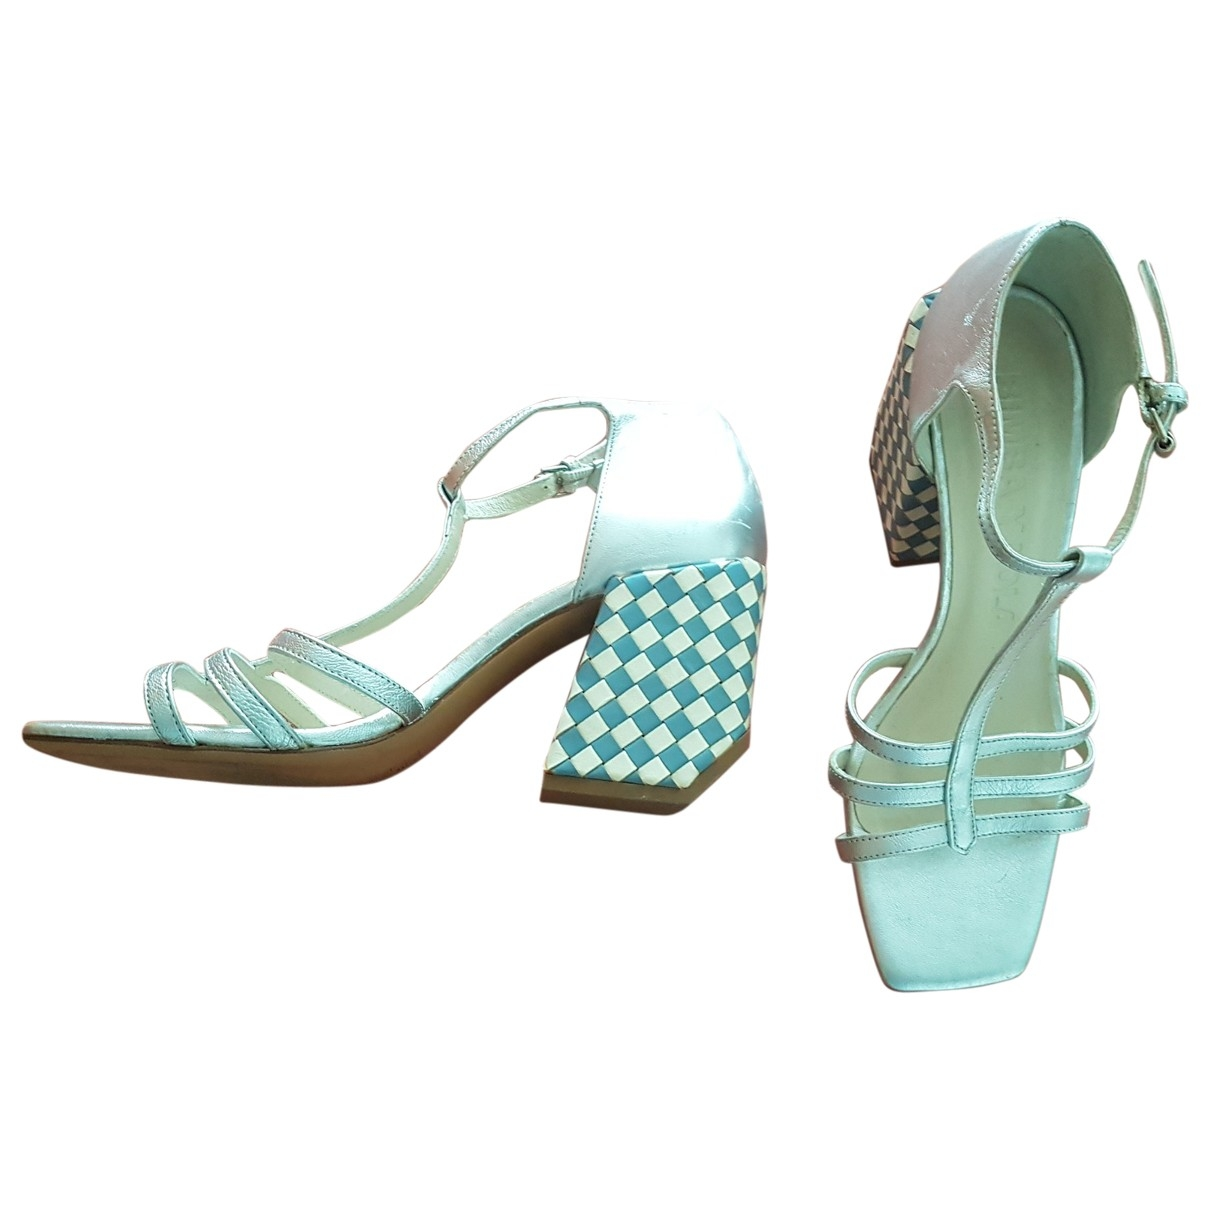 Bimba Y Lola \N Silver Leather Sandals for Women 39 EU